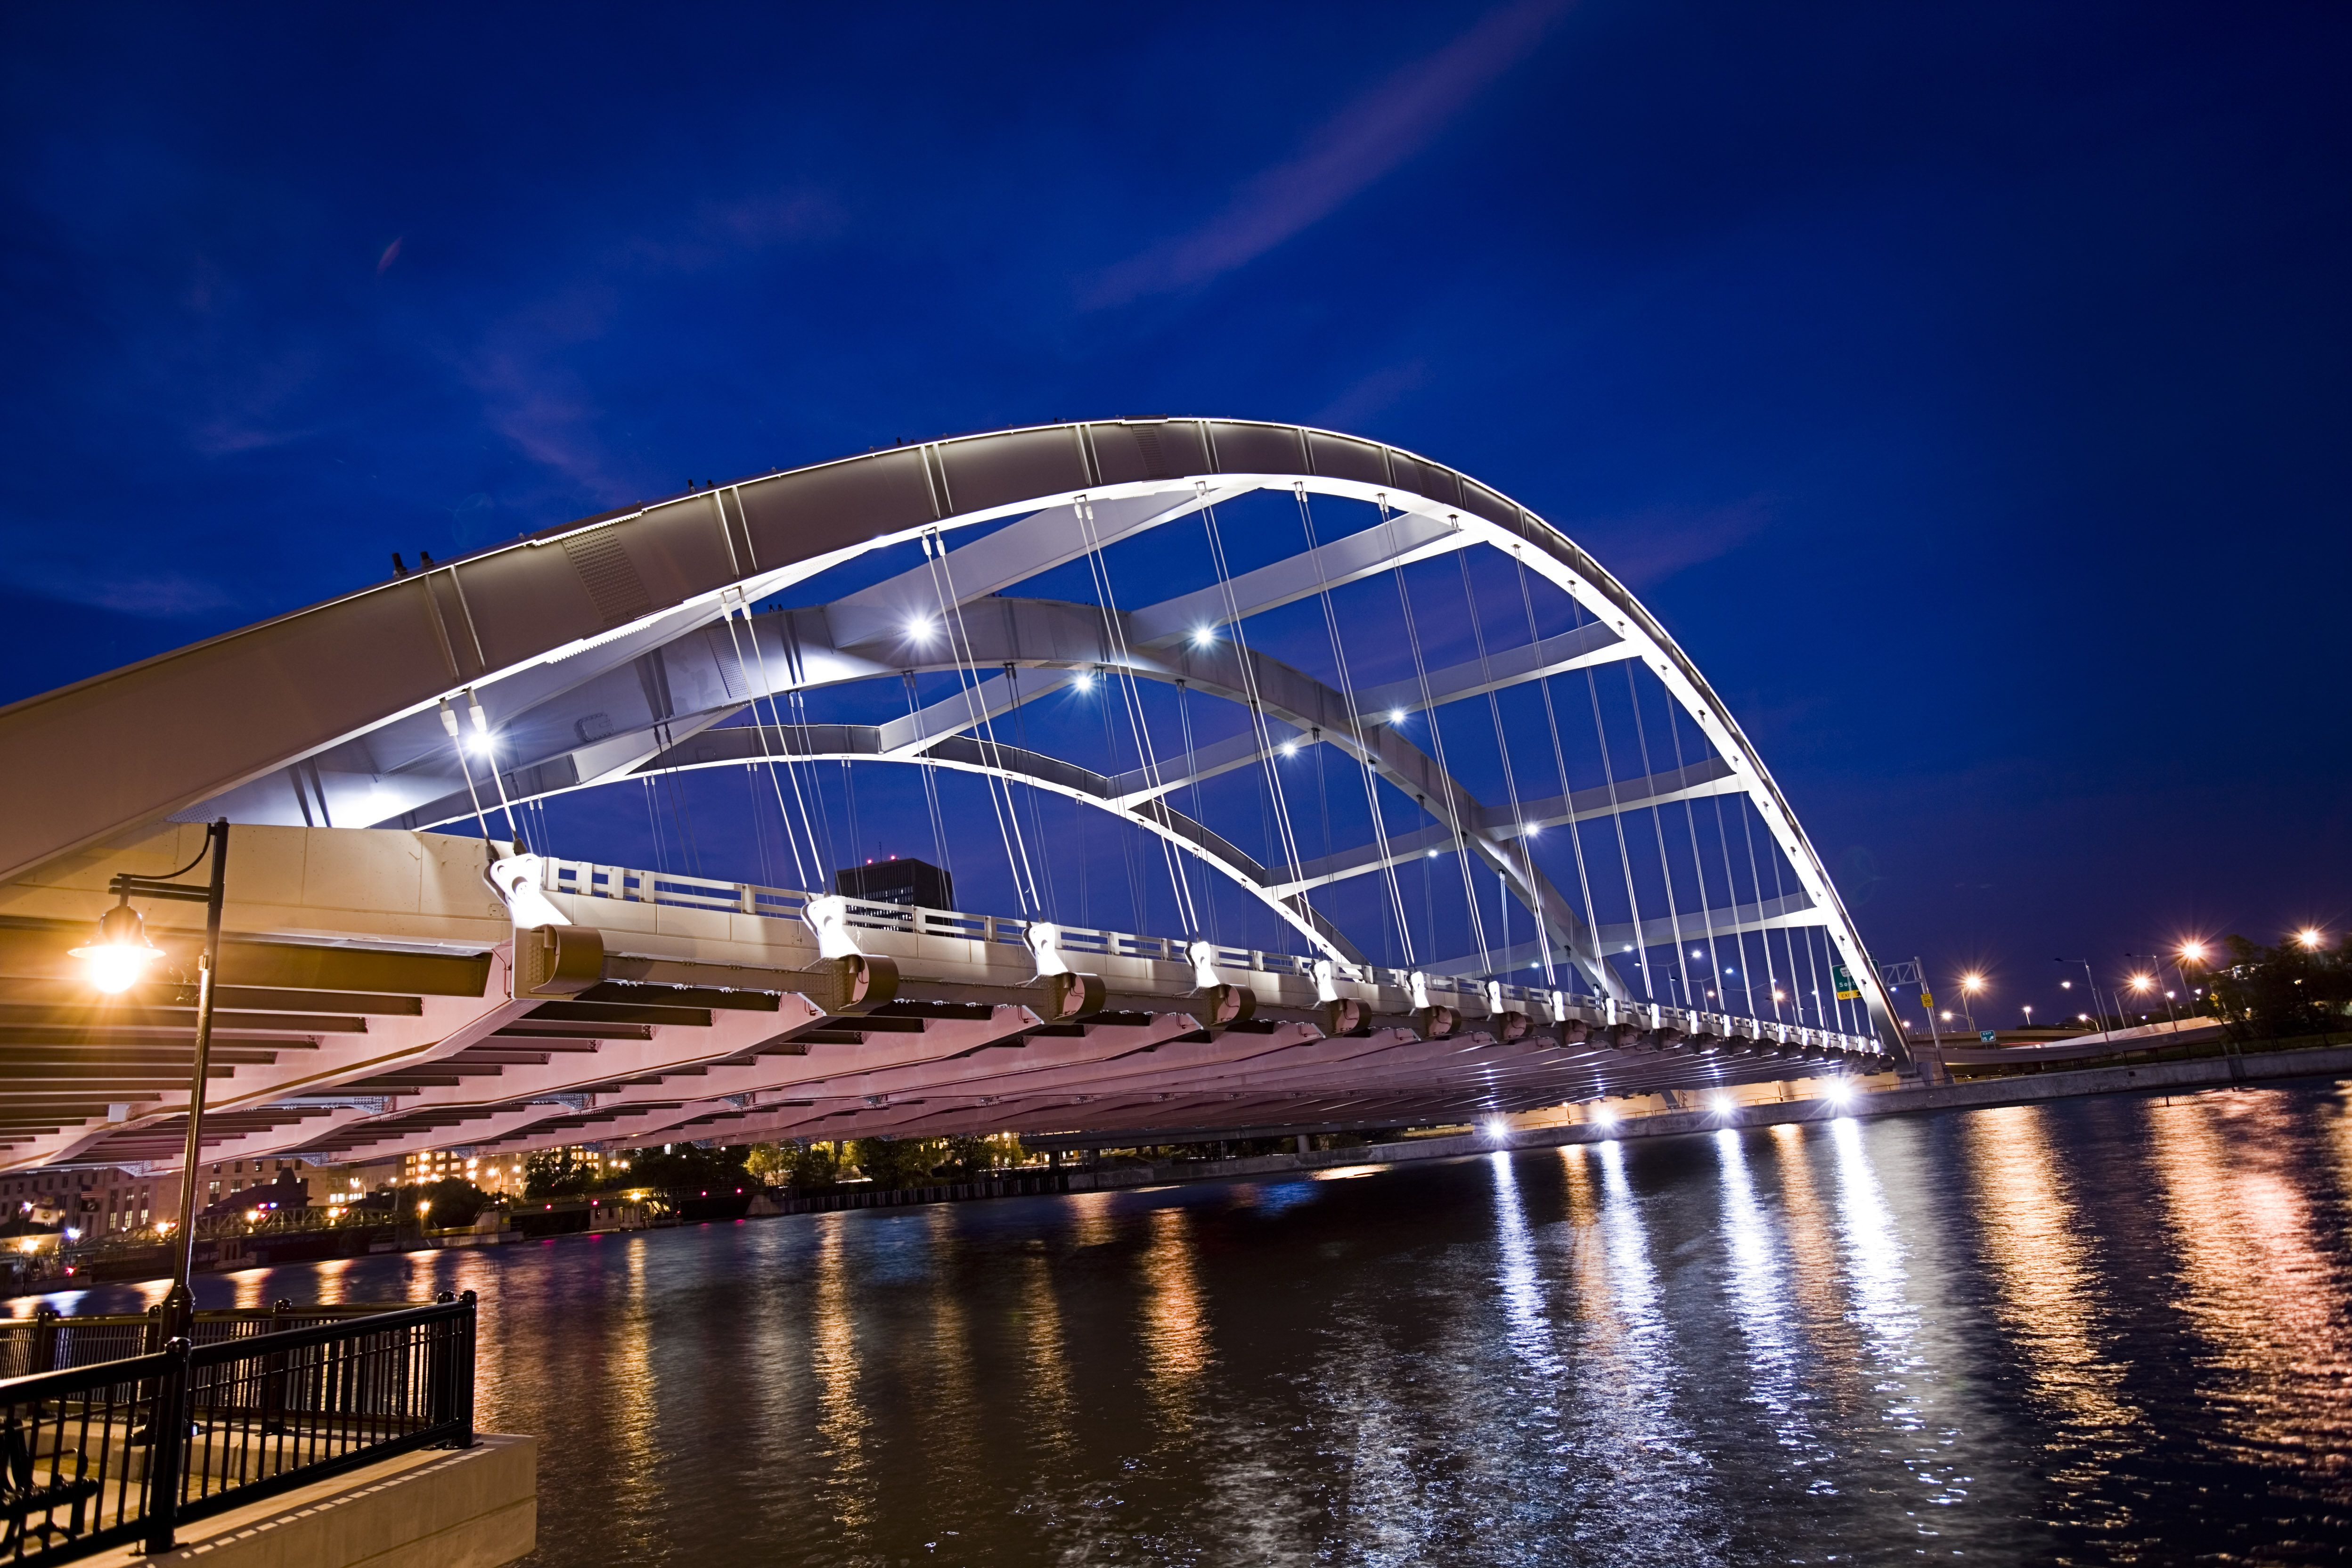 Frederick Douglass - Susan B. Anthony Memorial Bridge. Photo courtesy of the City of Rochester.